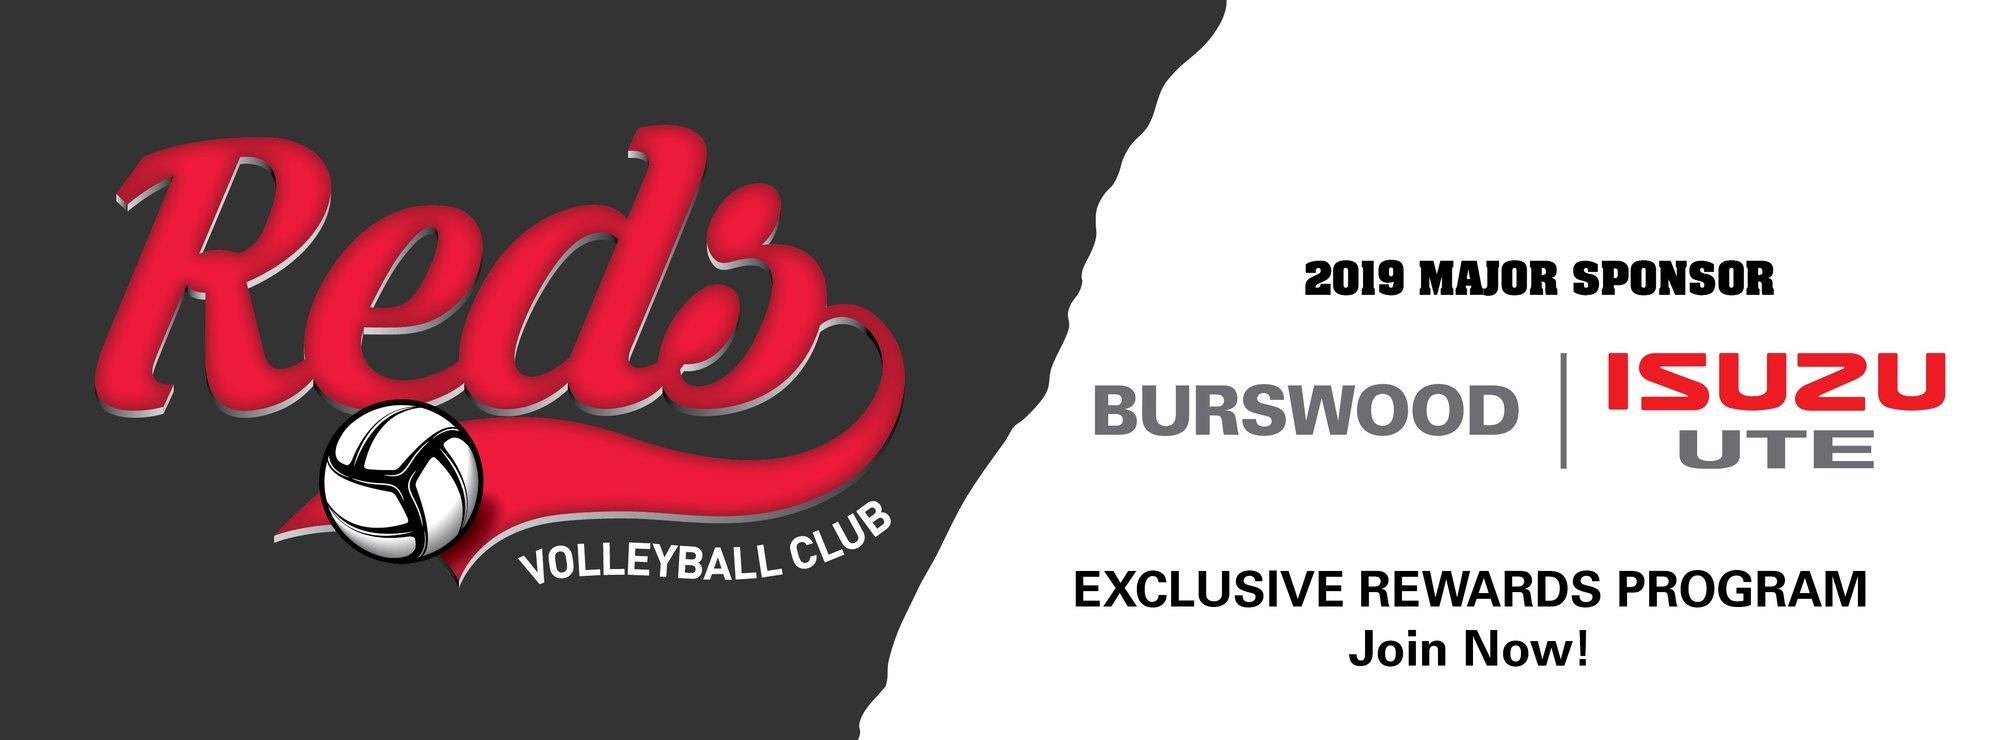 Burswood Isuzu UTE | Reds Sponsorship